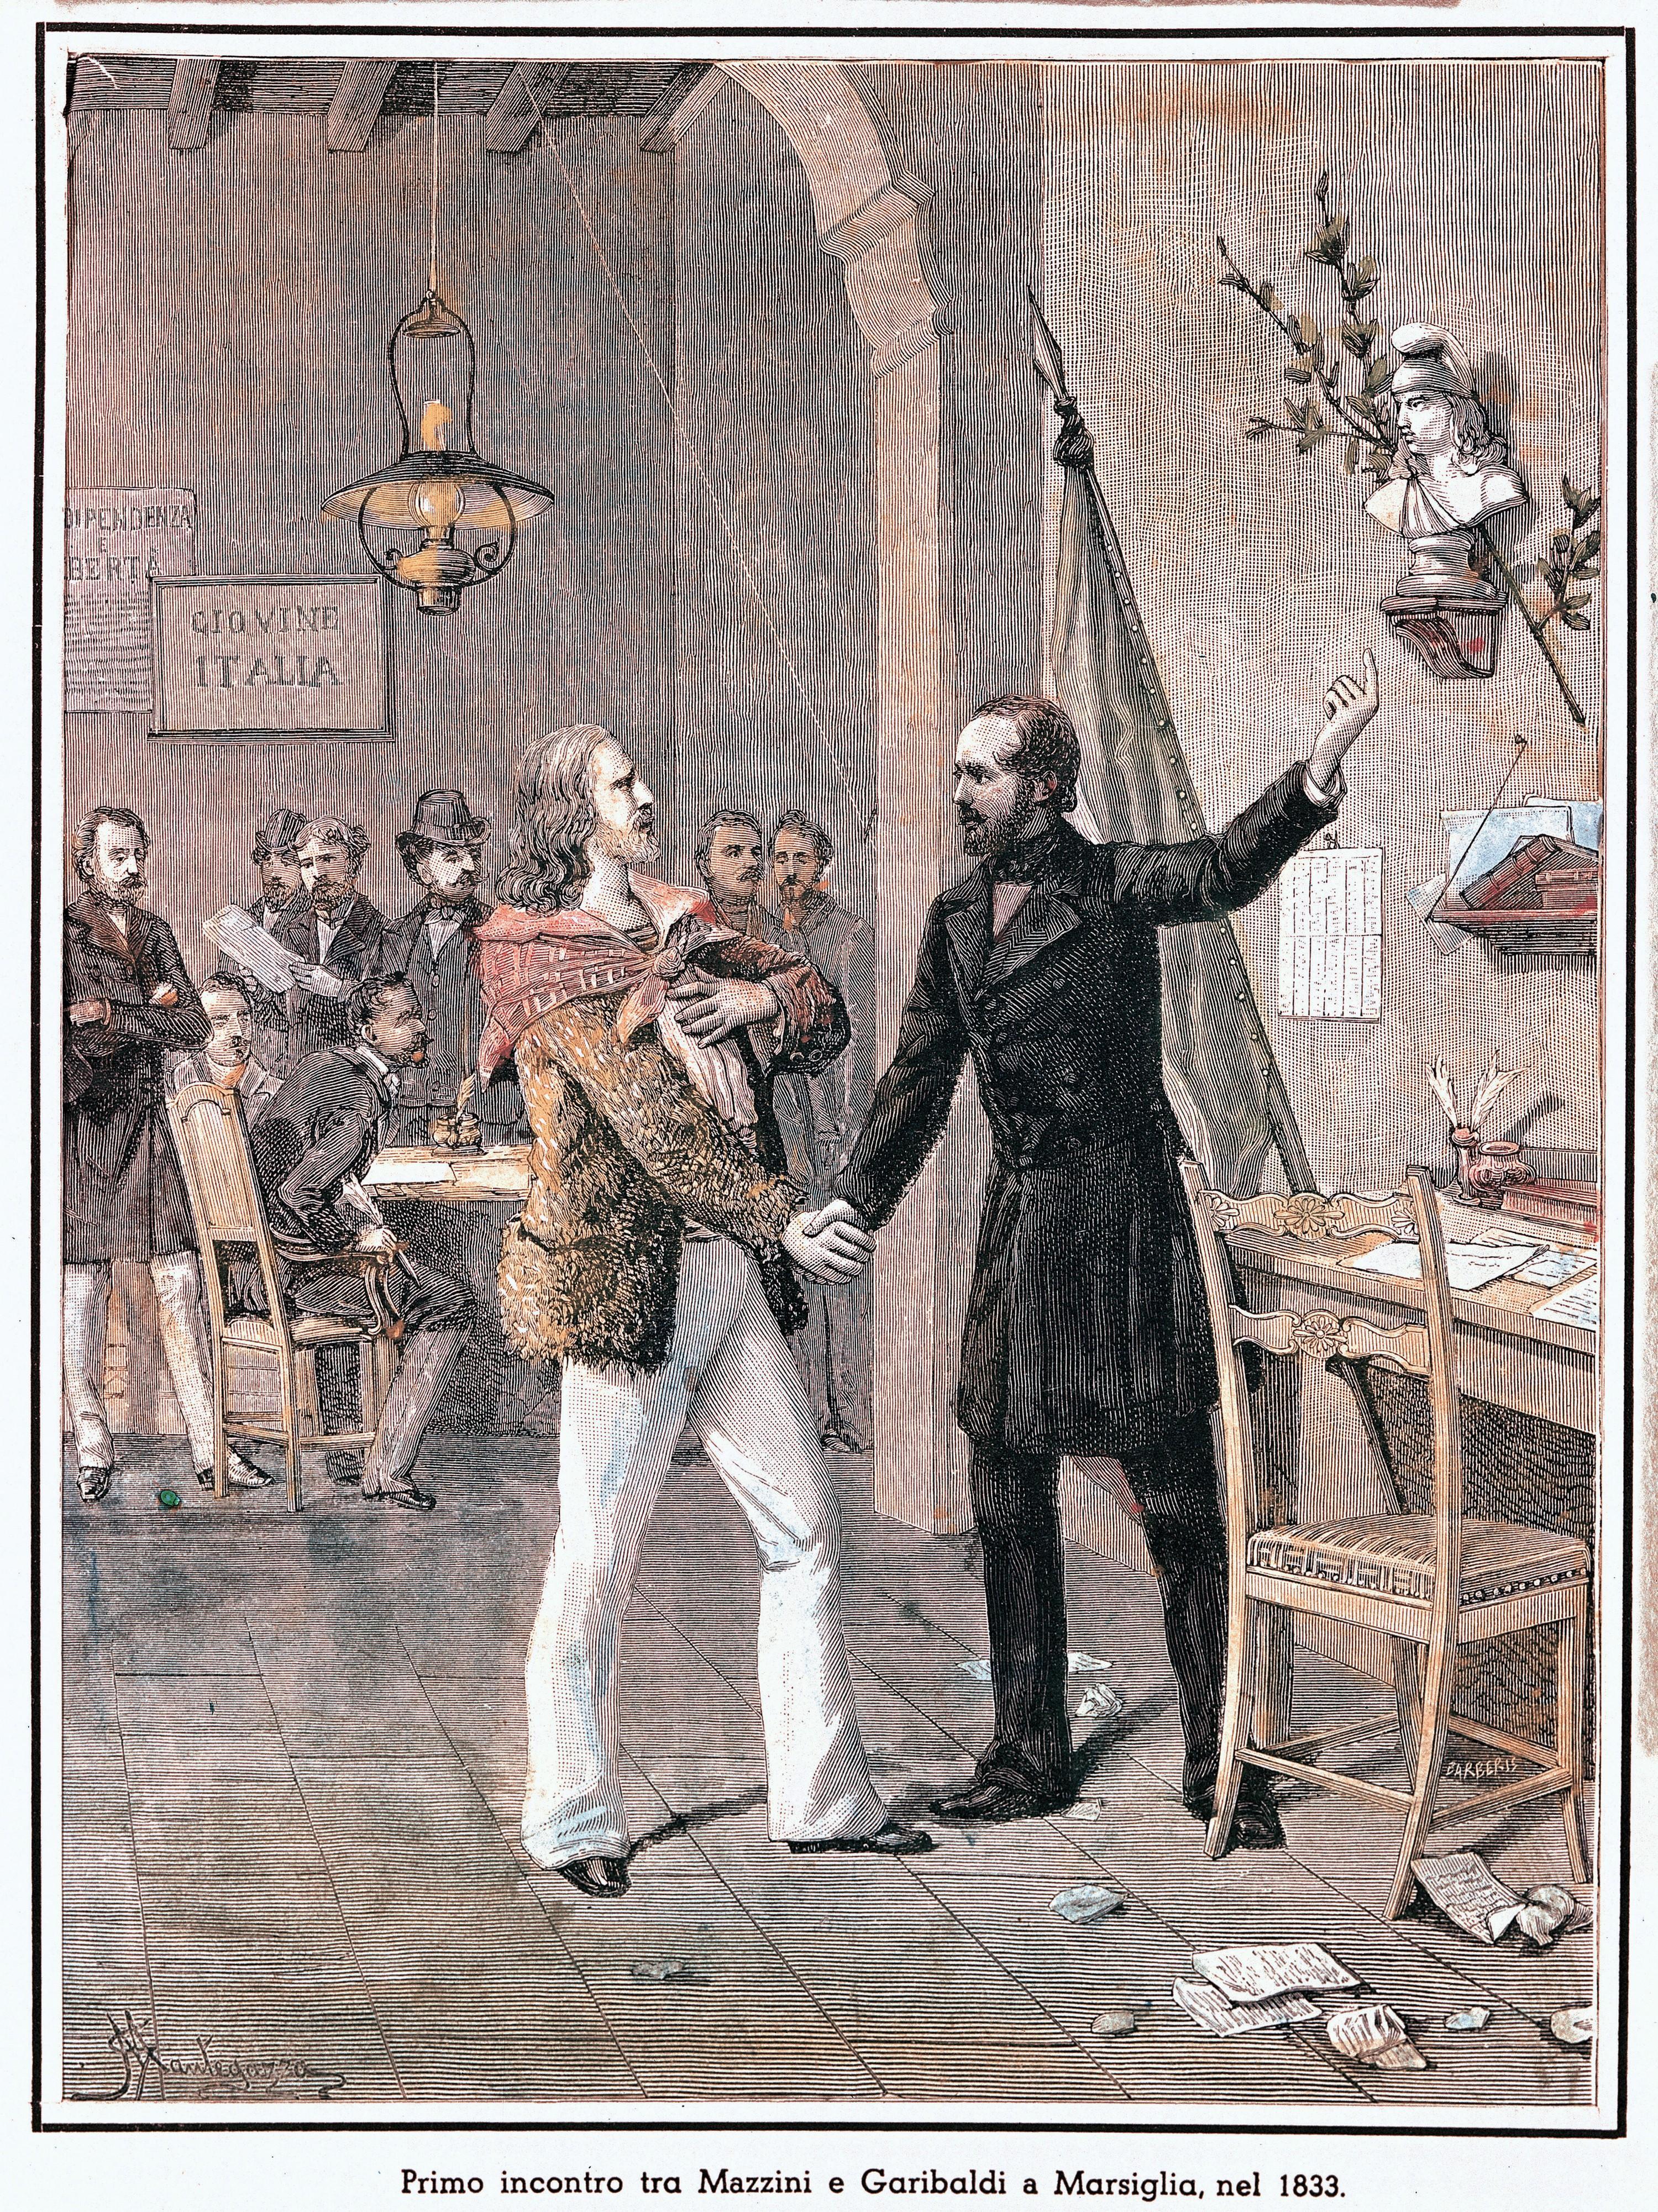 Anonyme, Première rencontre entre Giuseppe Garibaldi et Giuseppe Mazzini, v. 1833, gravure.